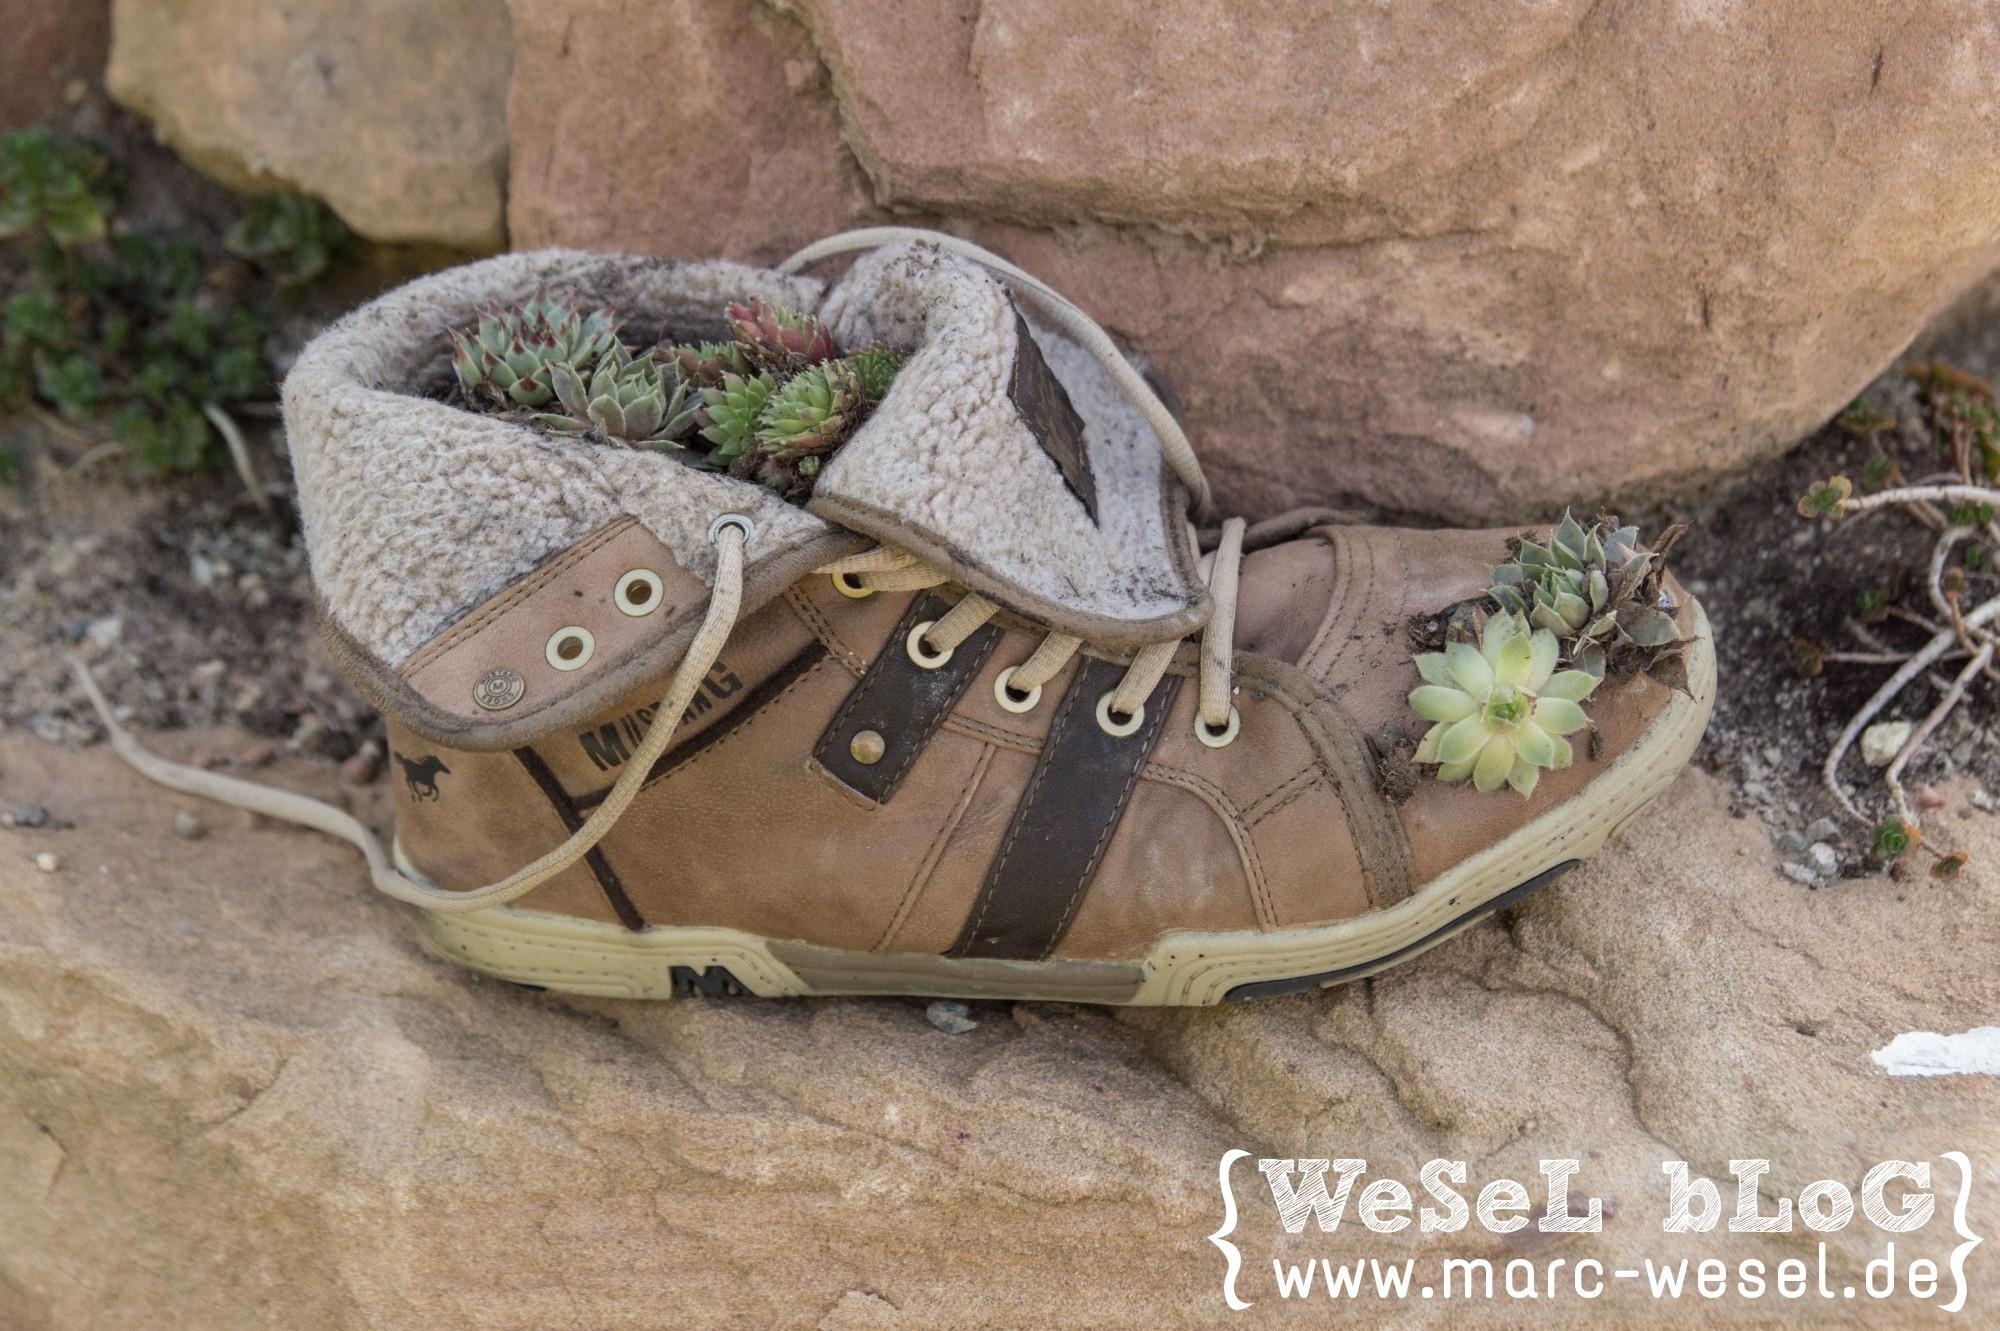 Schuh Upcycling mit Hauswurz